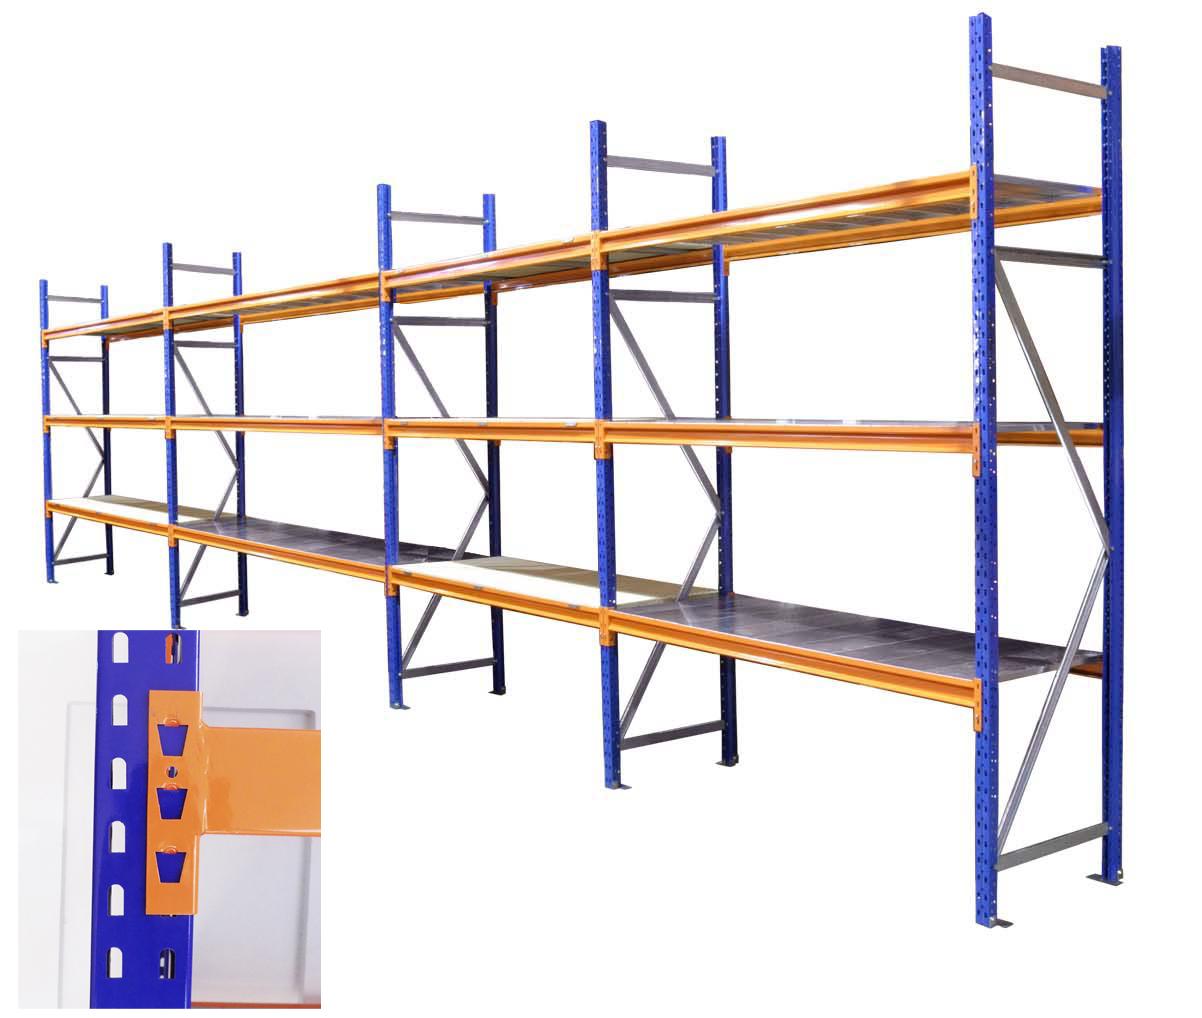 jxymzxsvbrhc pallet shelves for heavy storage warehouse rack duty selective kg product china